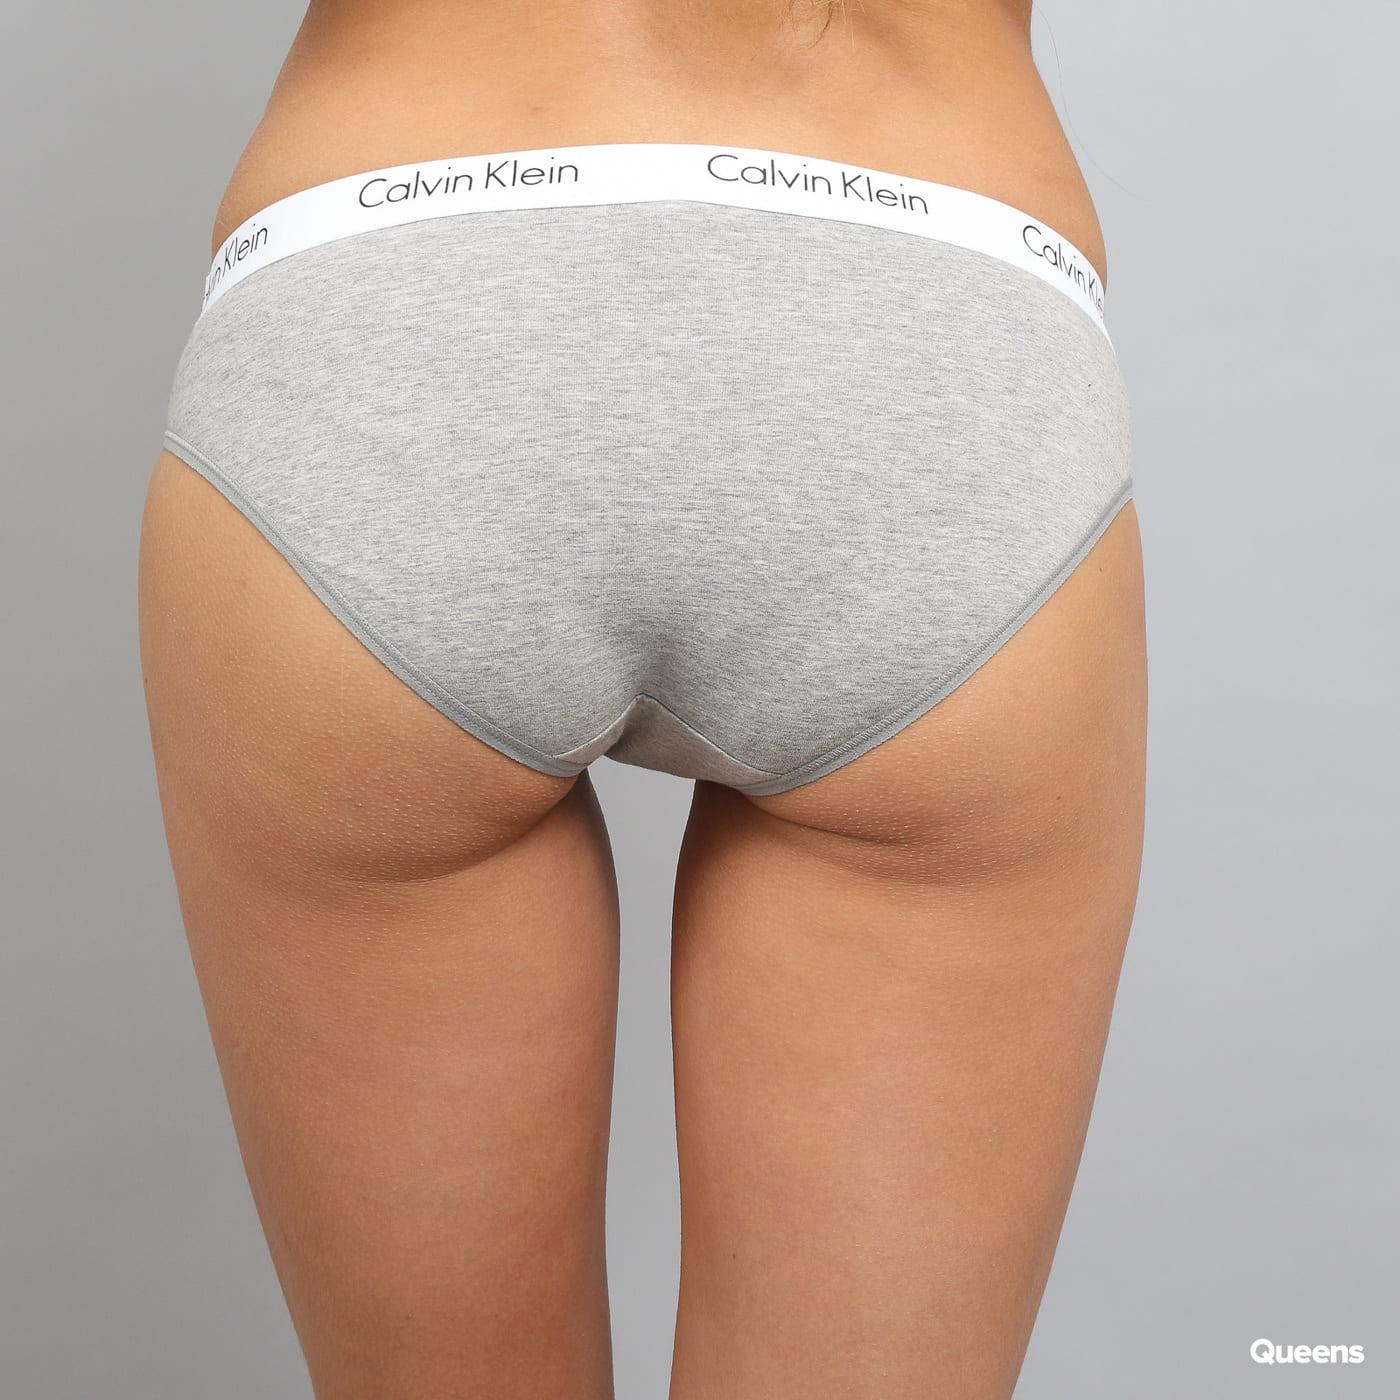 Calvin Klein 2 Pack Cotton Bikini - Slip C/O melange šedé / biele / čierne